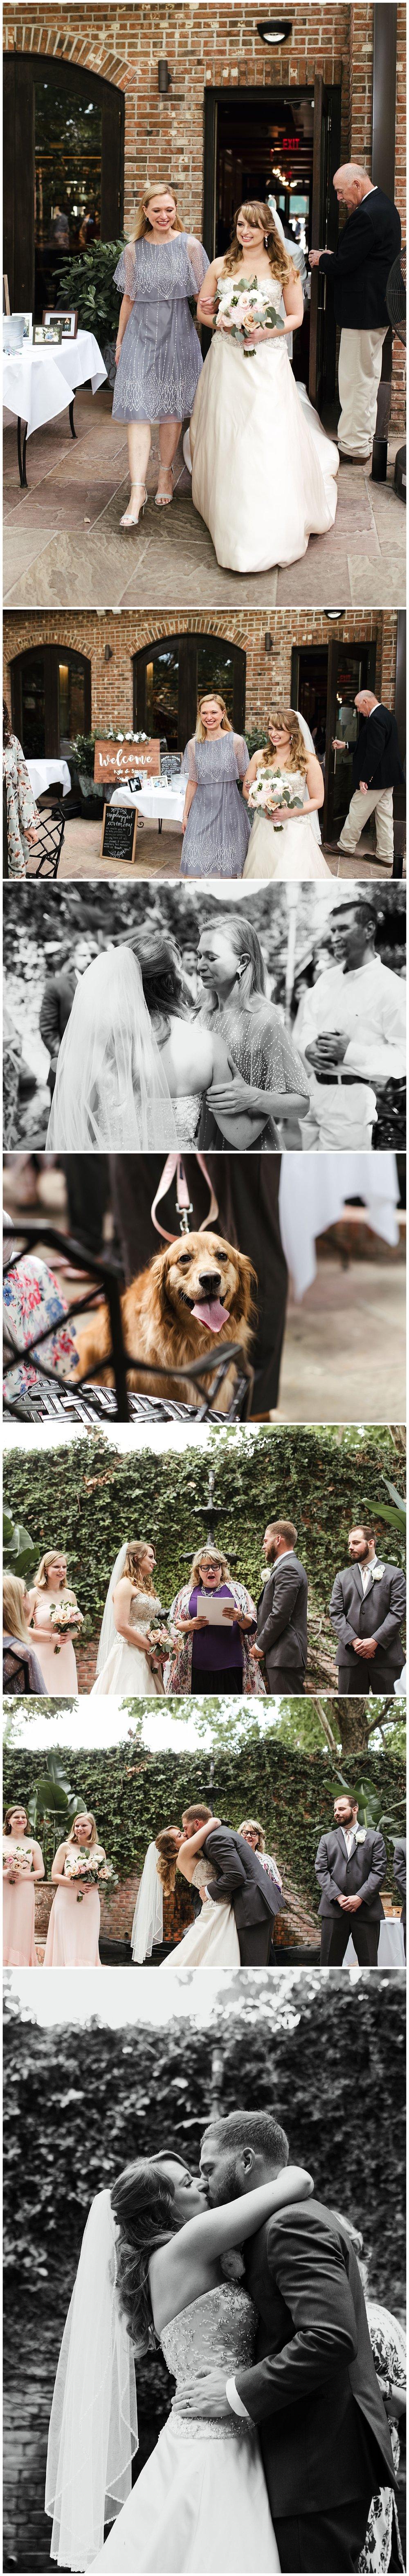 Houston Wedding, Brennan's of Houston wedding   Fort Worth Wedding Photographer   Dallas Wedding Photographer   www.jordanmitchellphotography.com